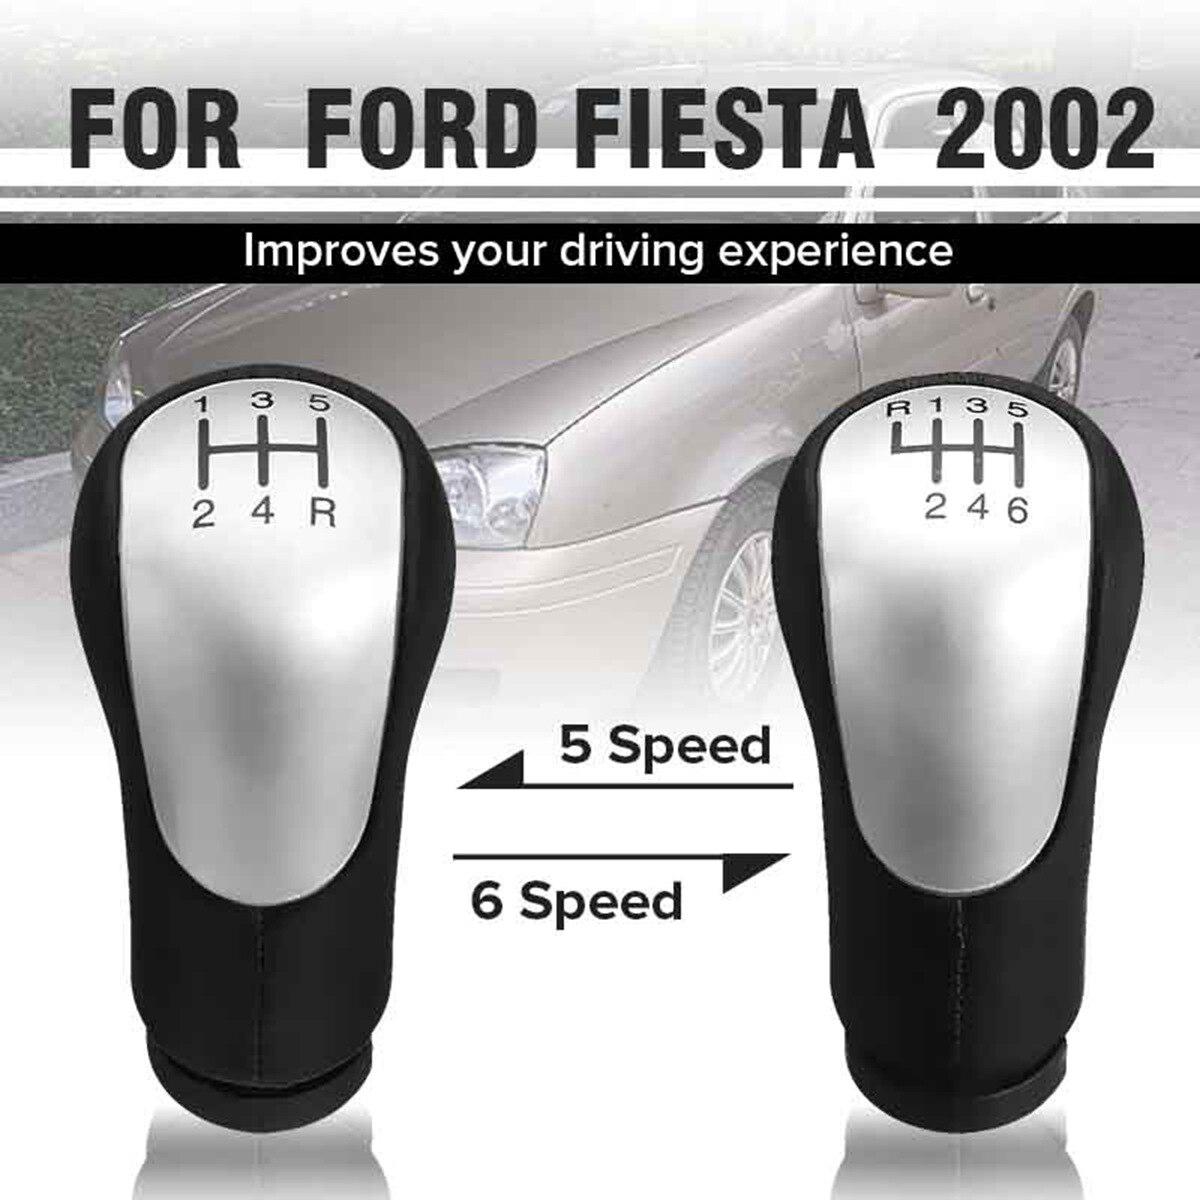 Perilla de palanca de cambios para coche de 5 velocidades y 6 velocidades, palanca de cambios para Ford Fiesta para conexión Fusion/Transit 2002